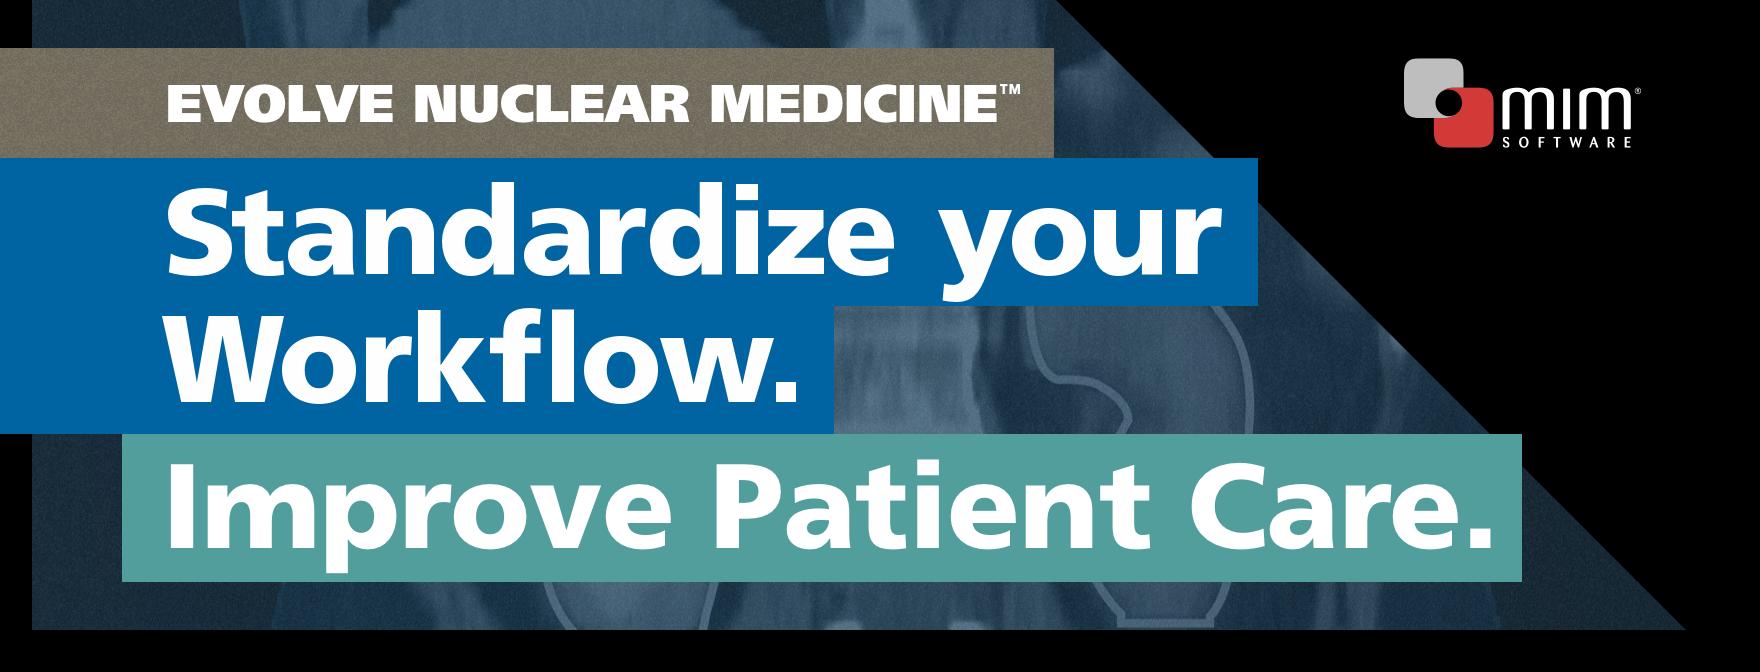 Evolve Nuclear Medicine™: Standardize your Workflow. Improve Patient Care.